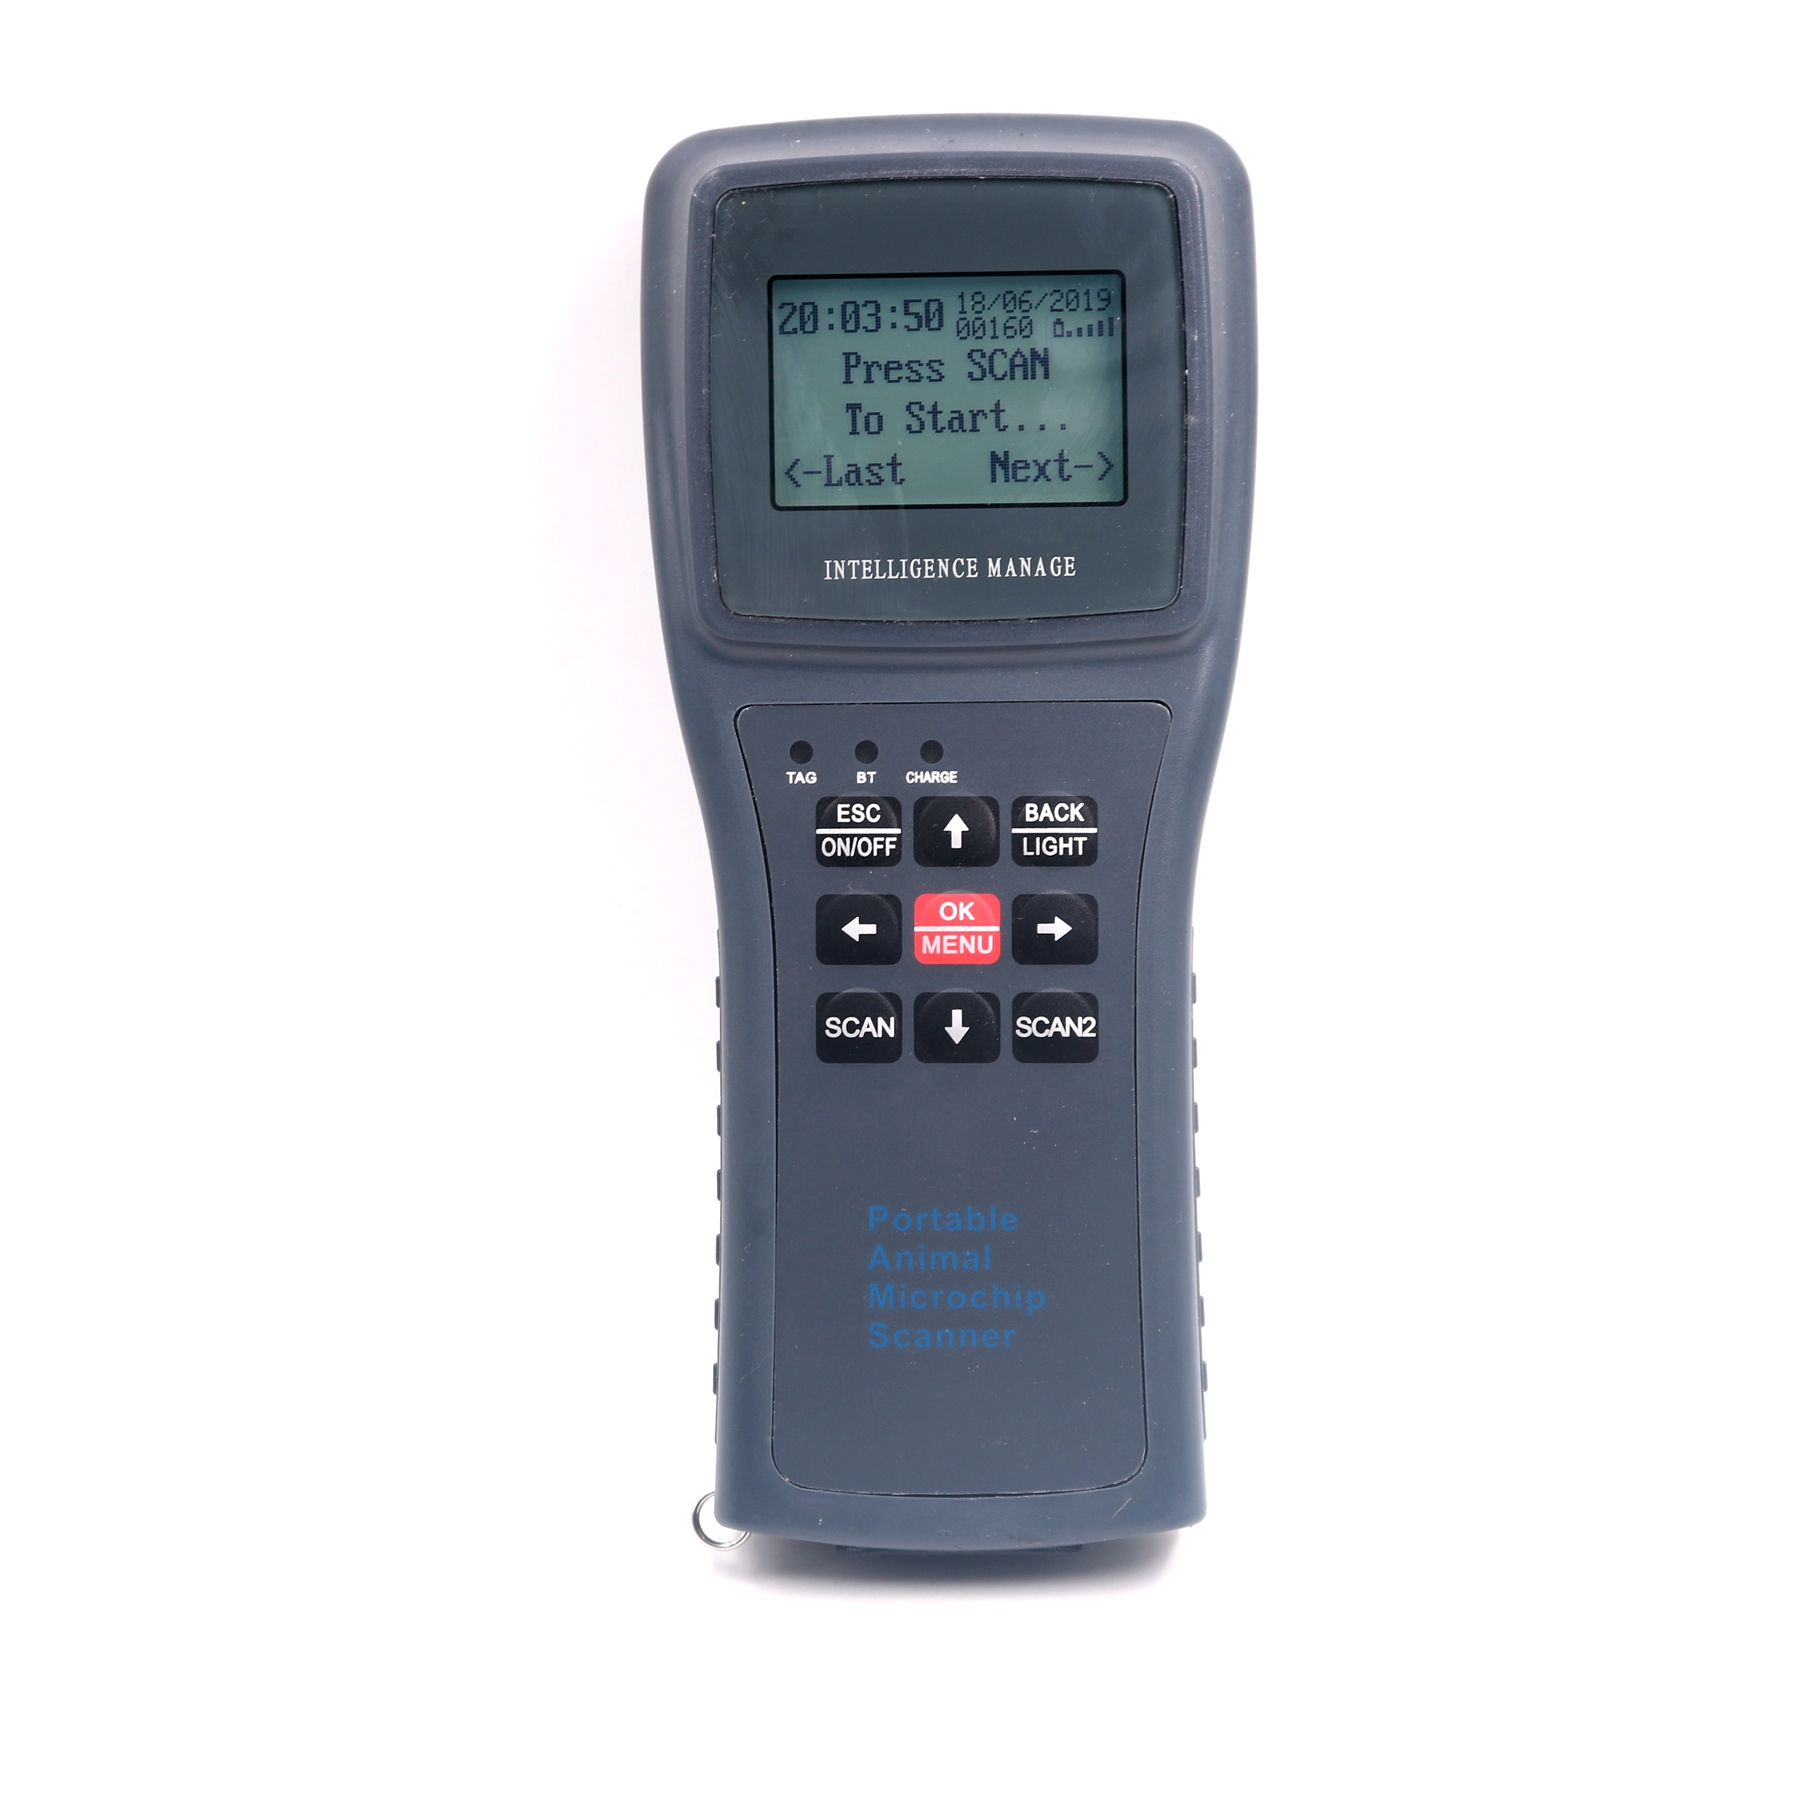 134.2KHz Long Distance Large Memory Portable Animal Microchip Scanner Animal Ear Tag Reader Handheld